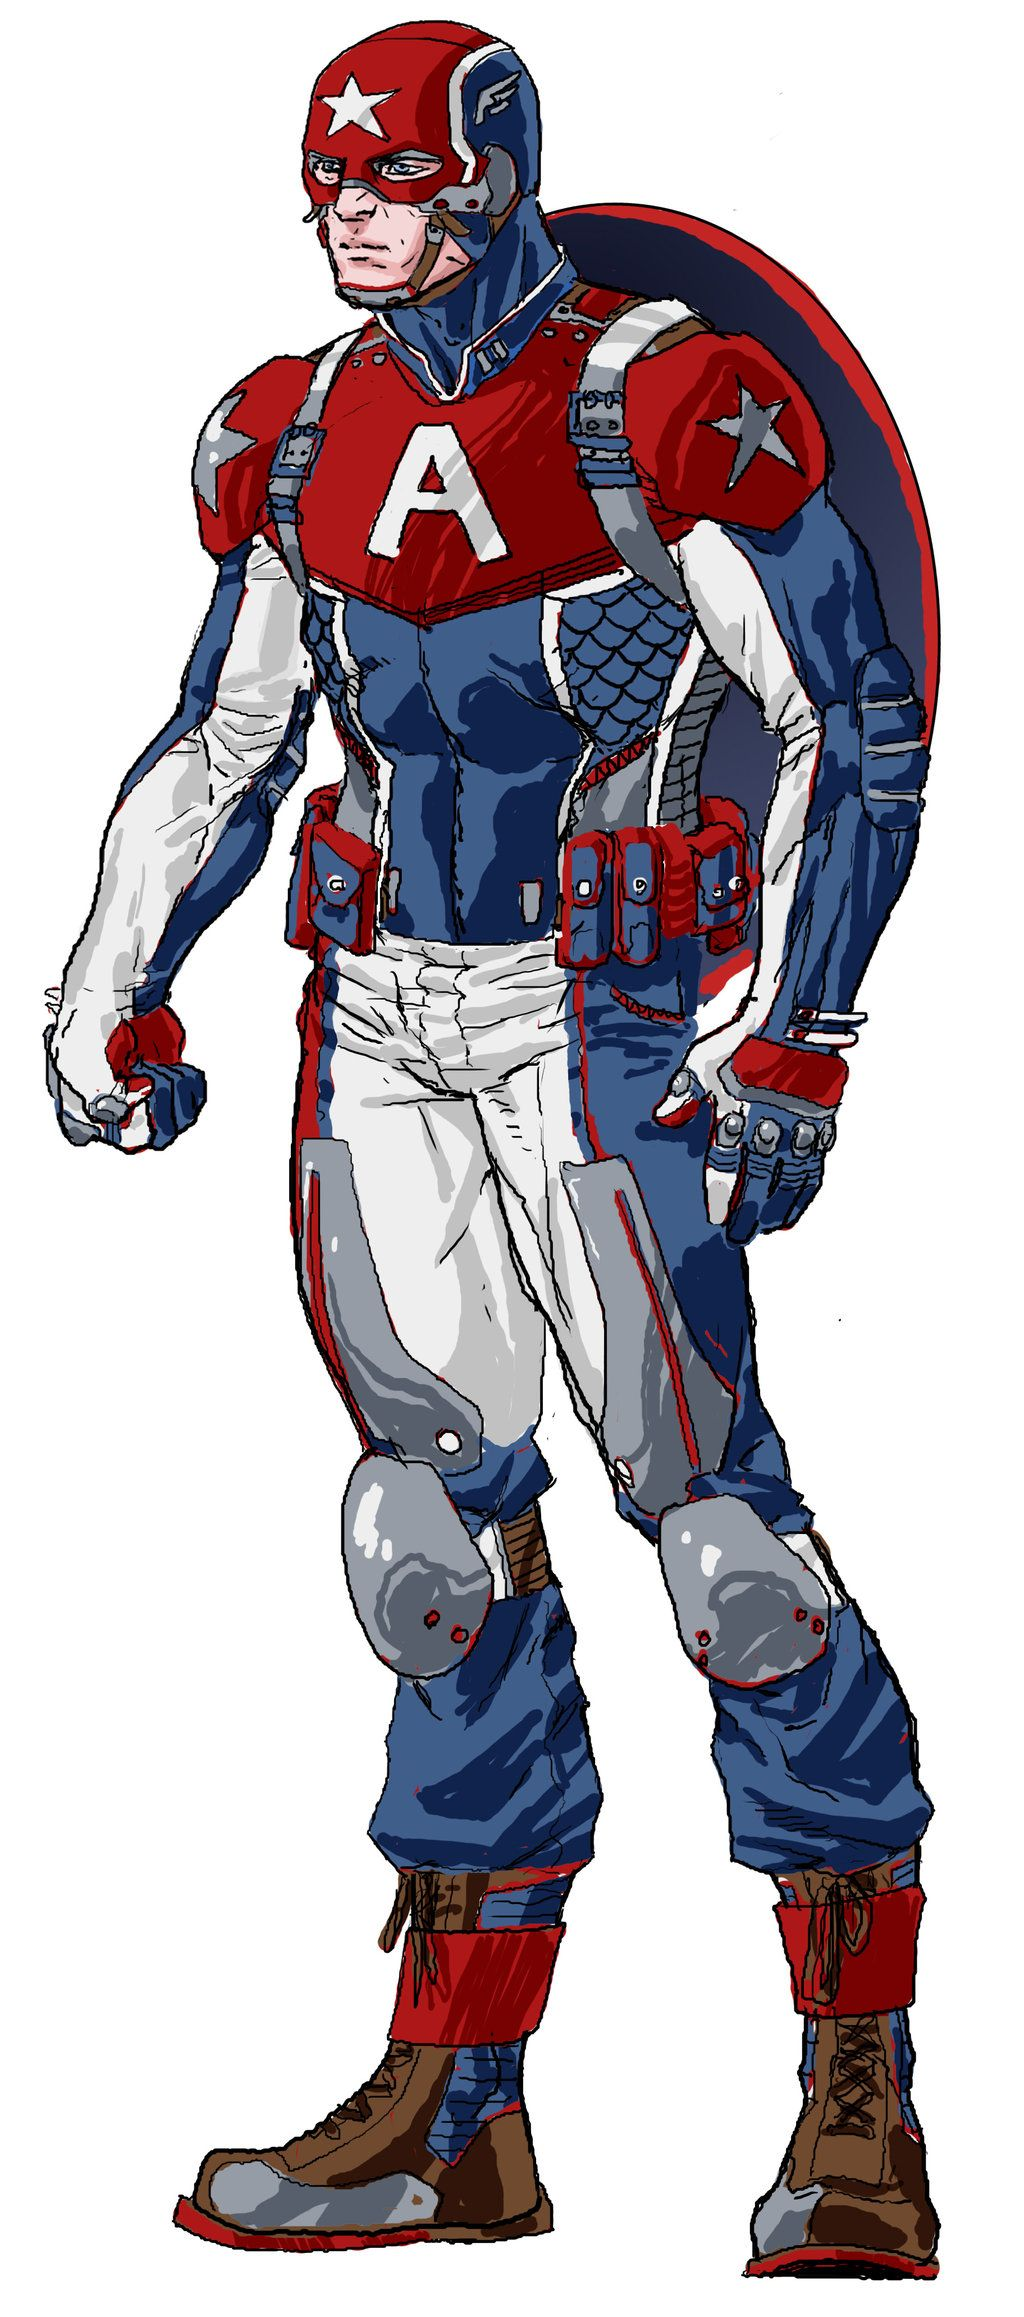 5bfa6c23843 Captain America Redesign. If they put this in the next Cap movie